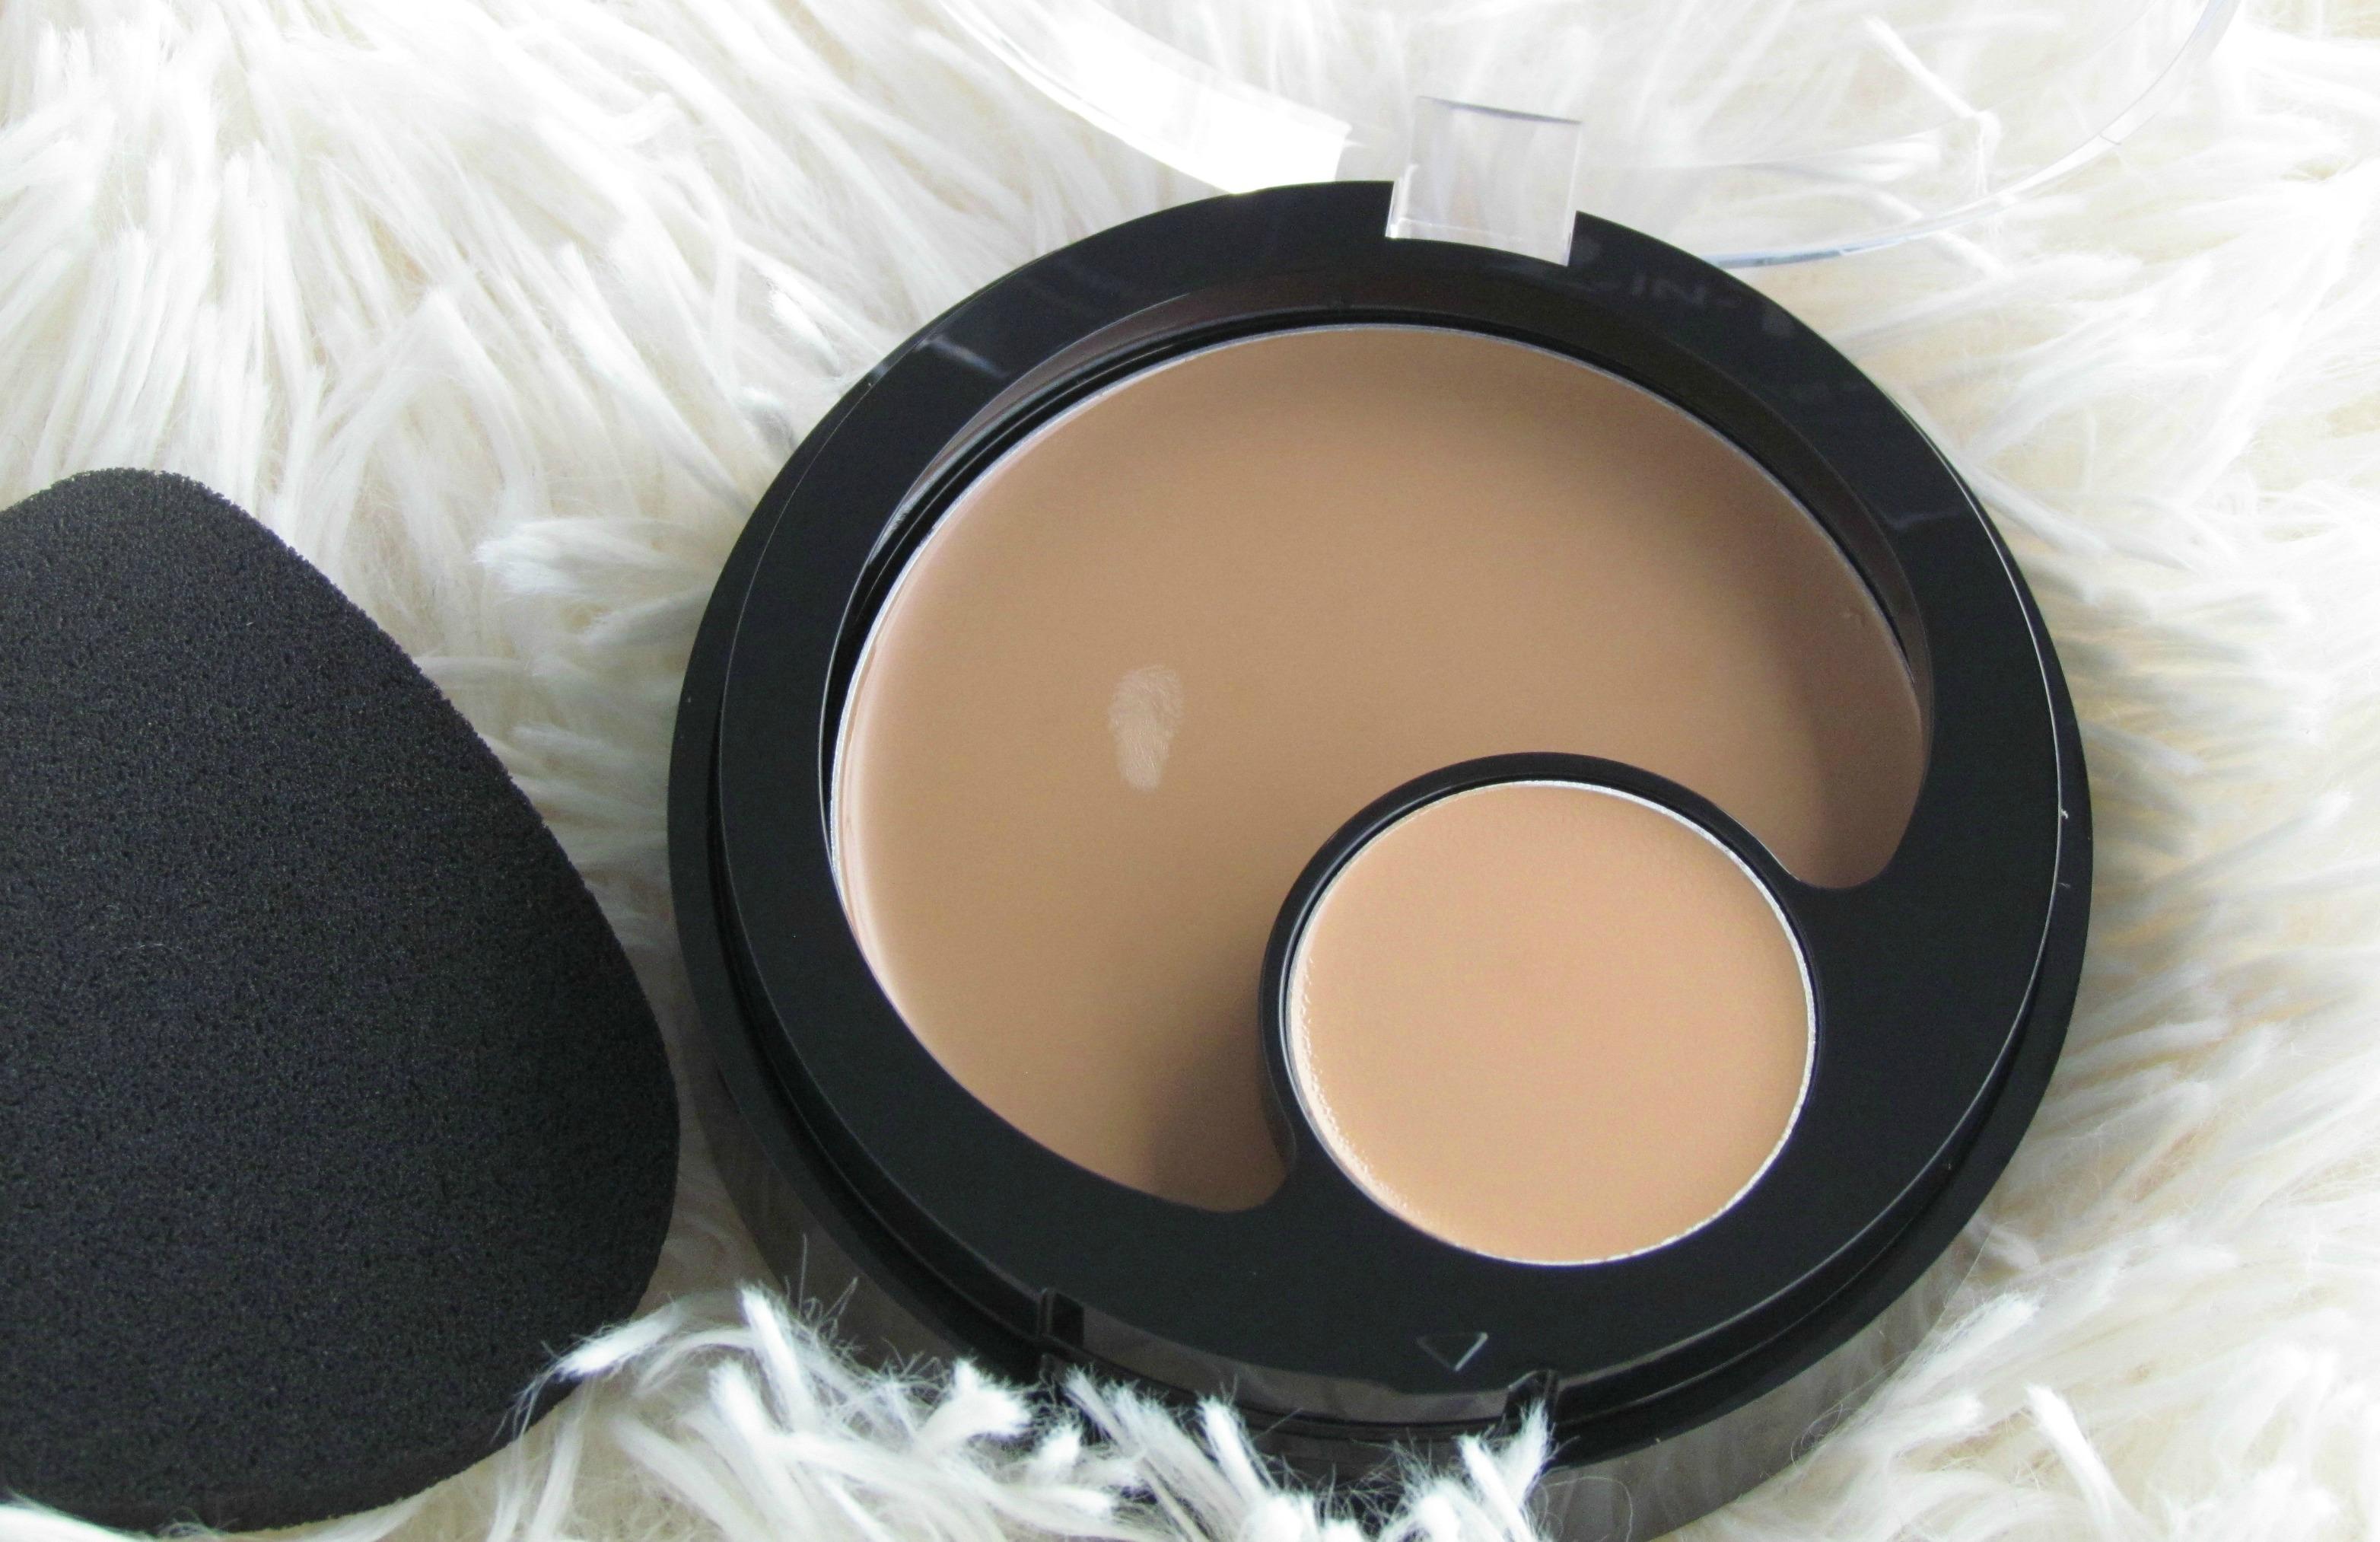 Revlon Colorstay 2-in-1 Compact Makeup & Concealer – 330 Natural Tan, 310 Warm Golden